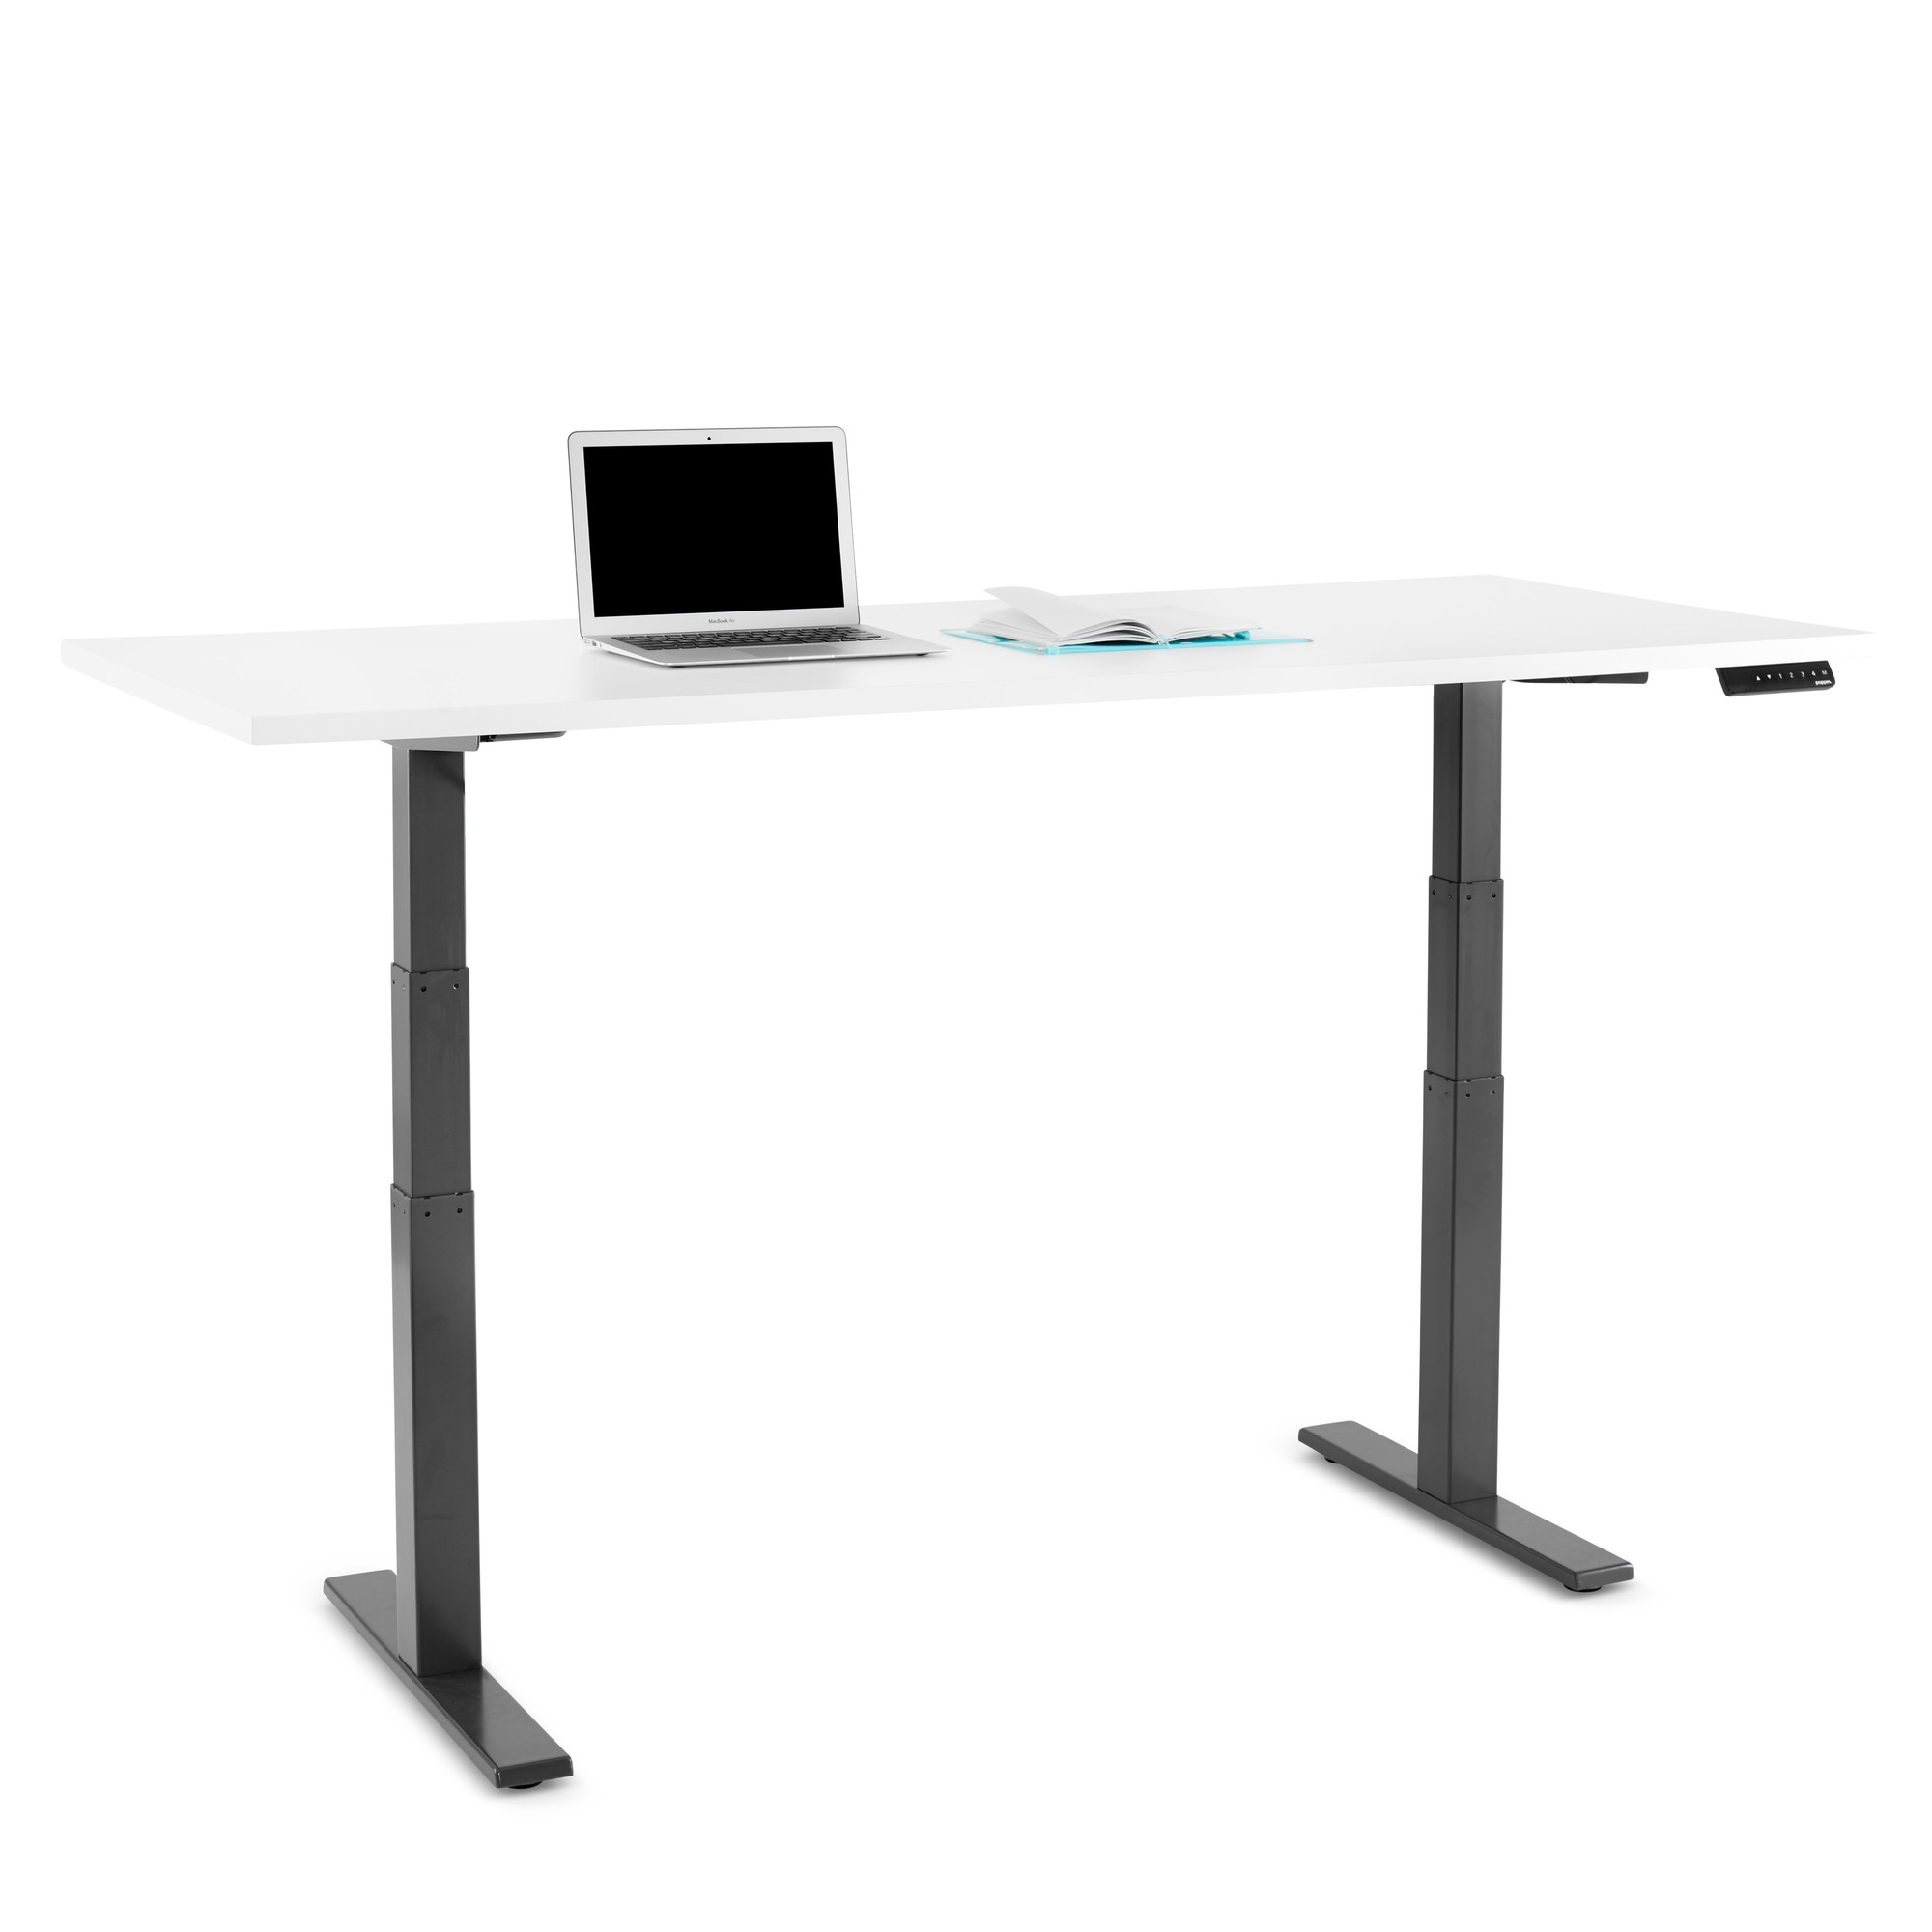 loft adjustable height table white 72 x 30 charcoal legs - Adjustable Height Computer Desk